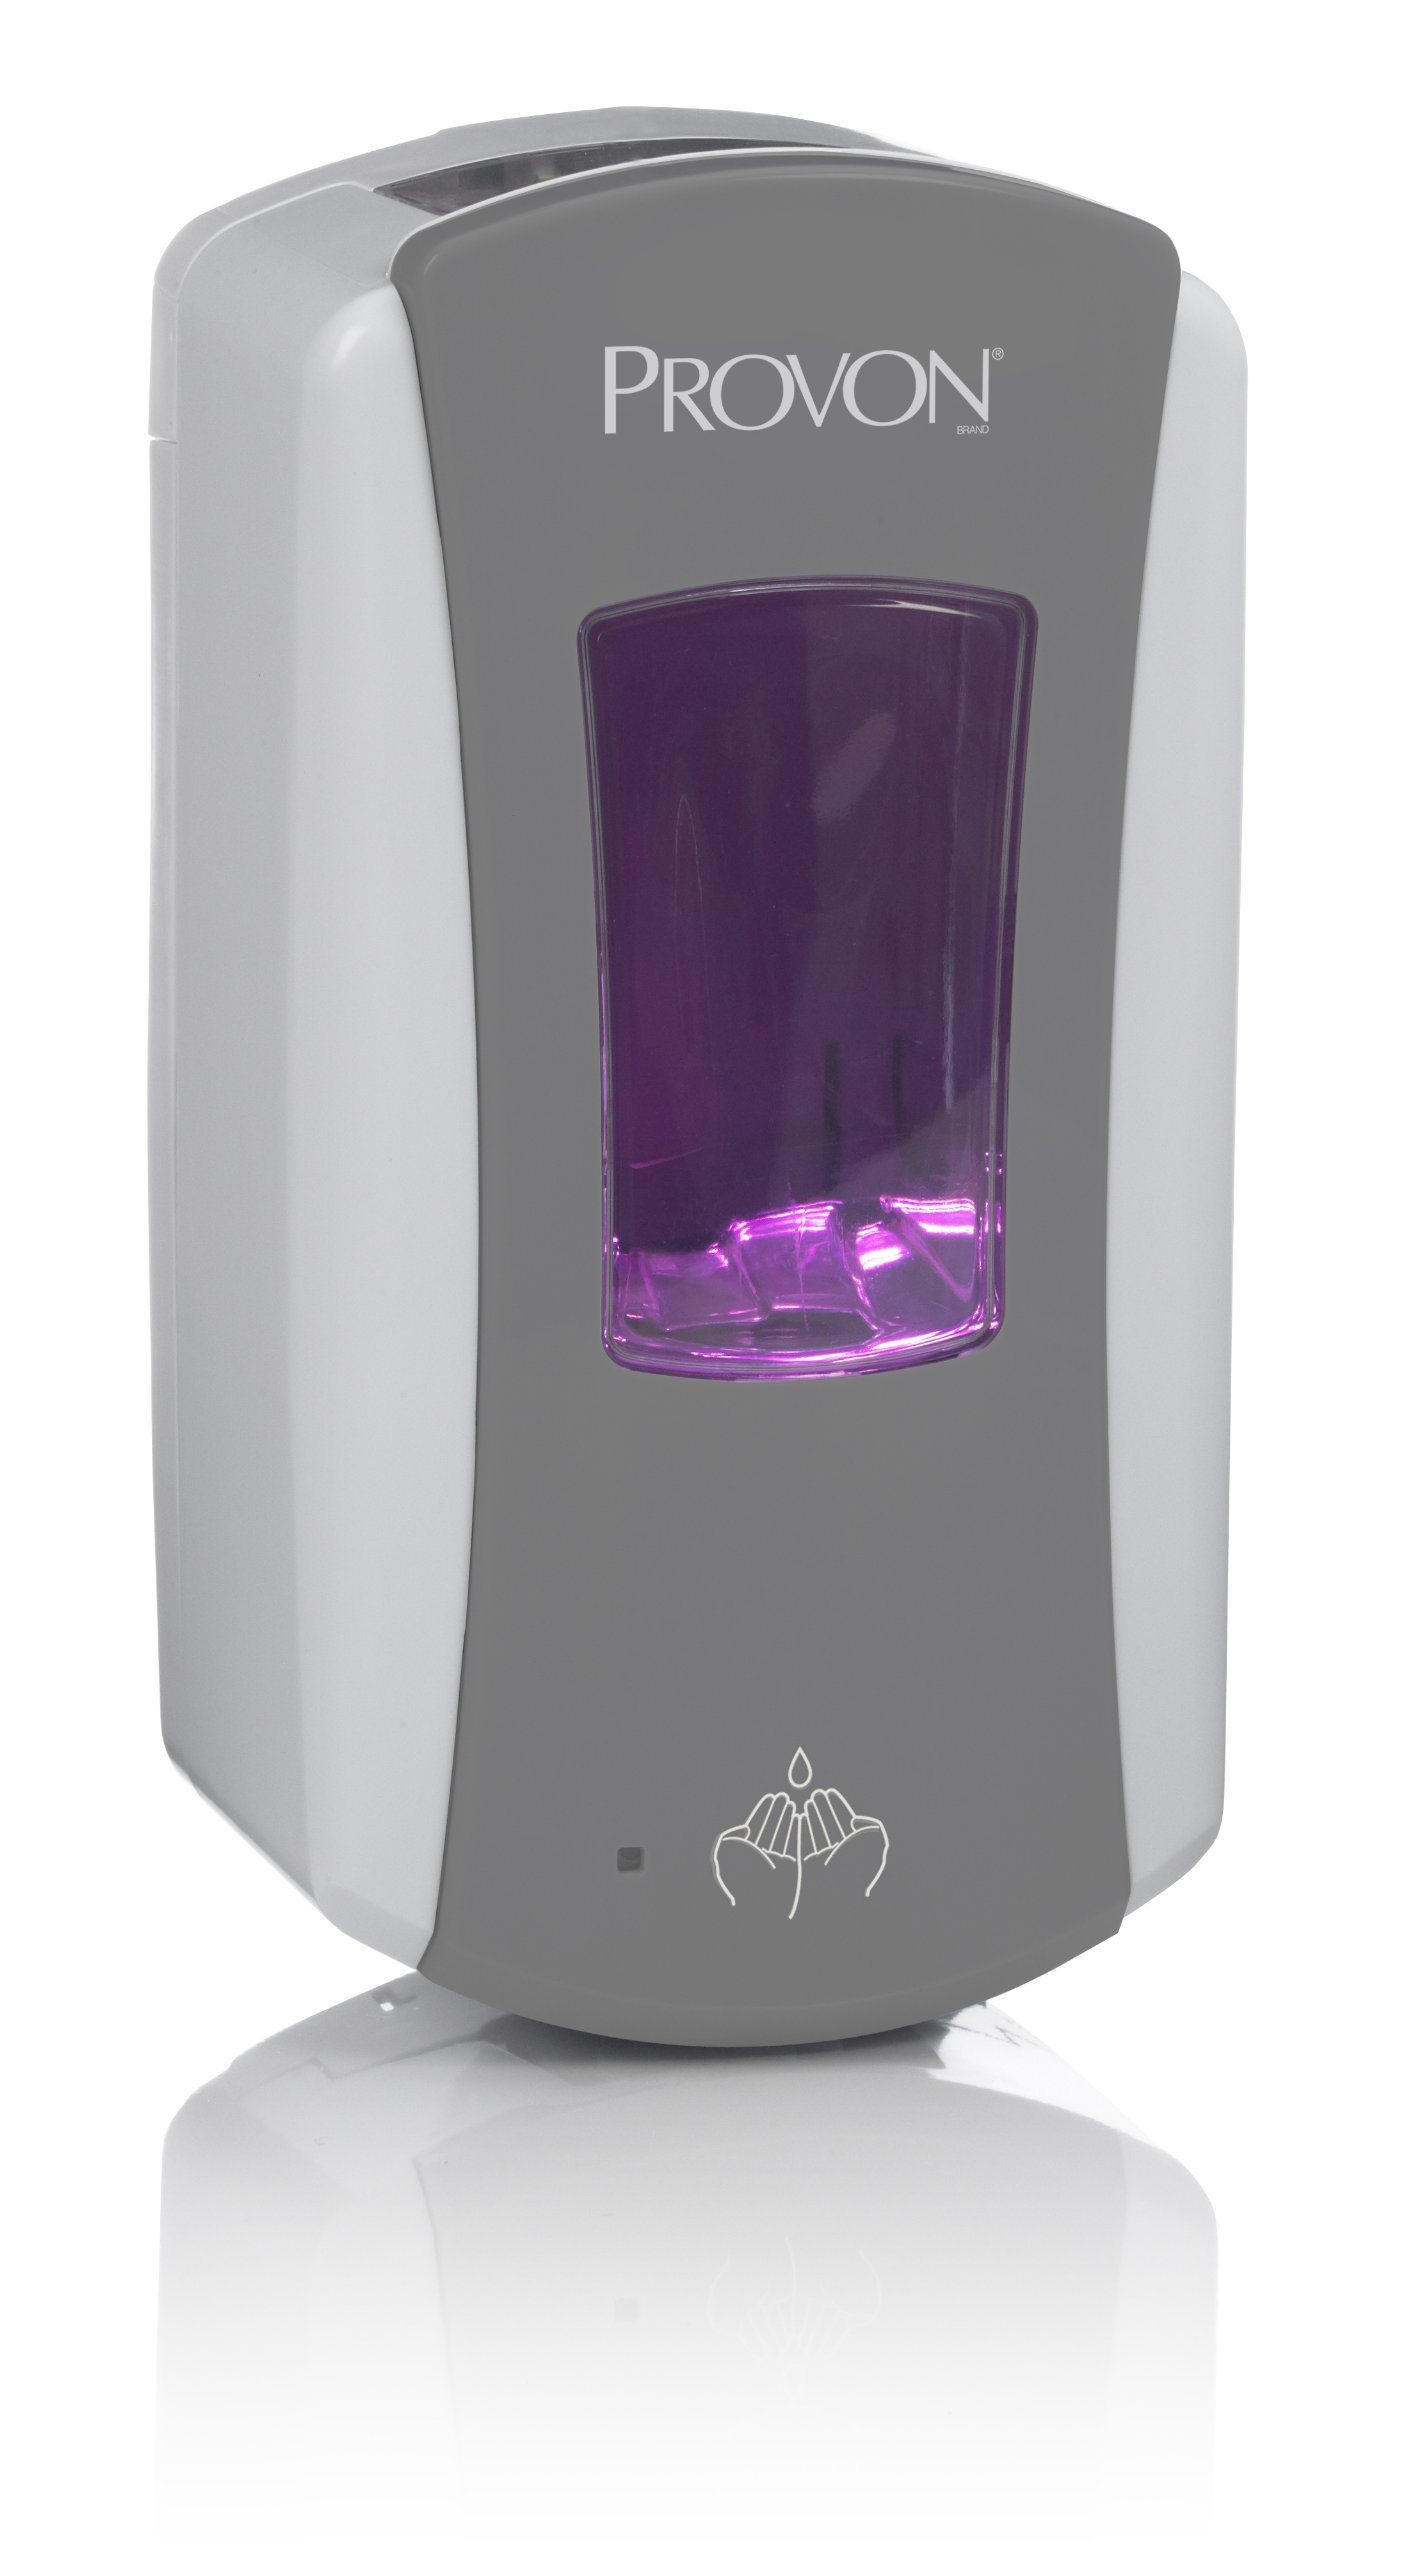 PROVON 1971-01 LTX-12 Dispenser, 1200mL Capacity, Grey/White